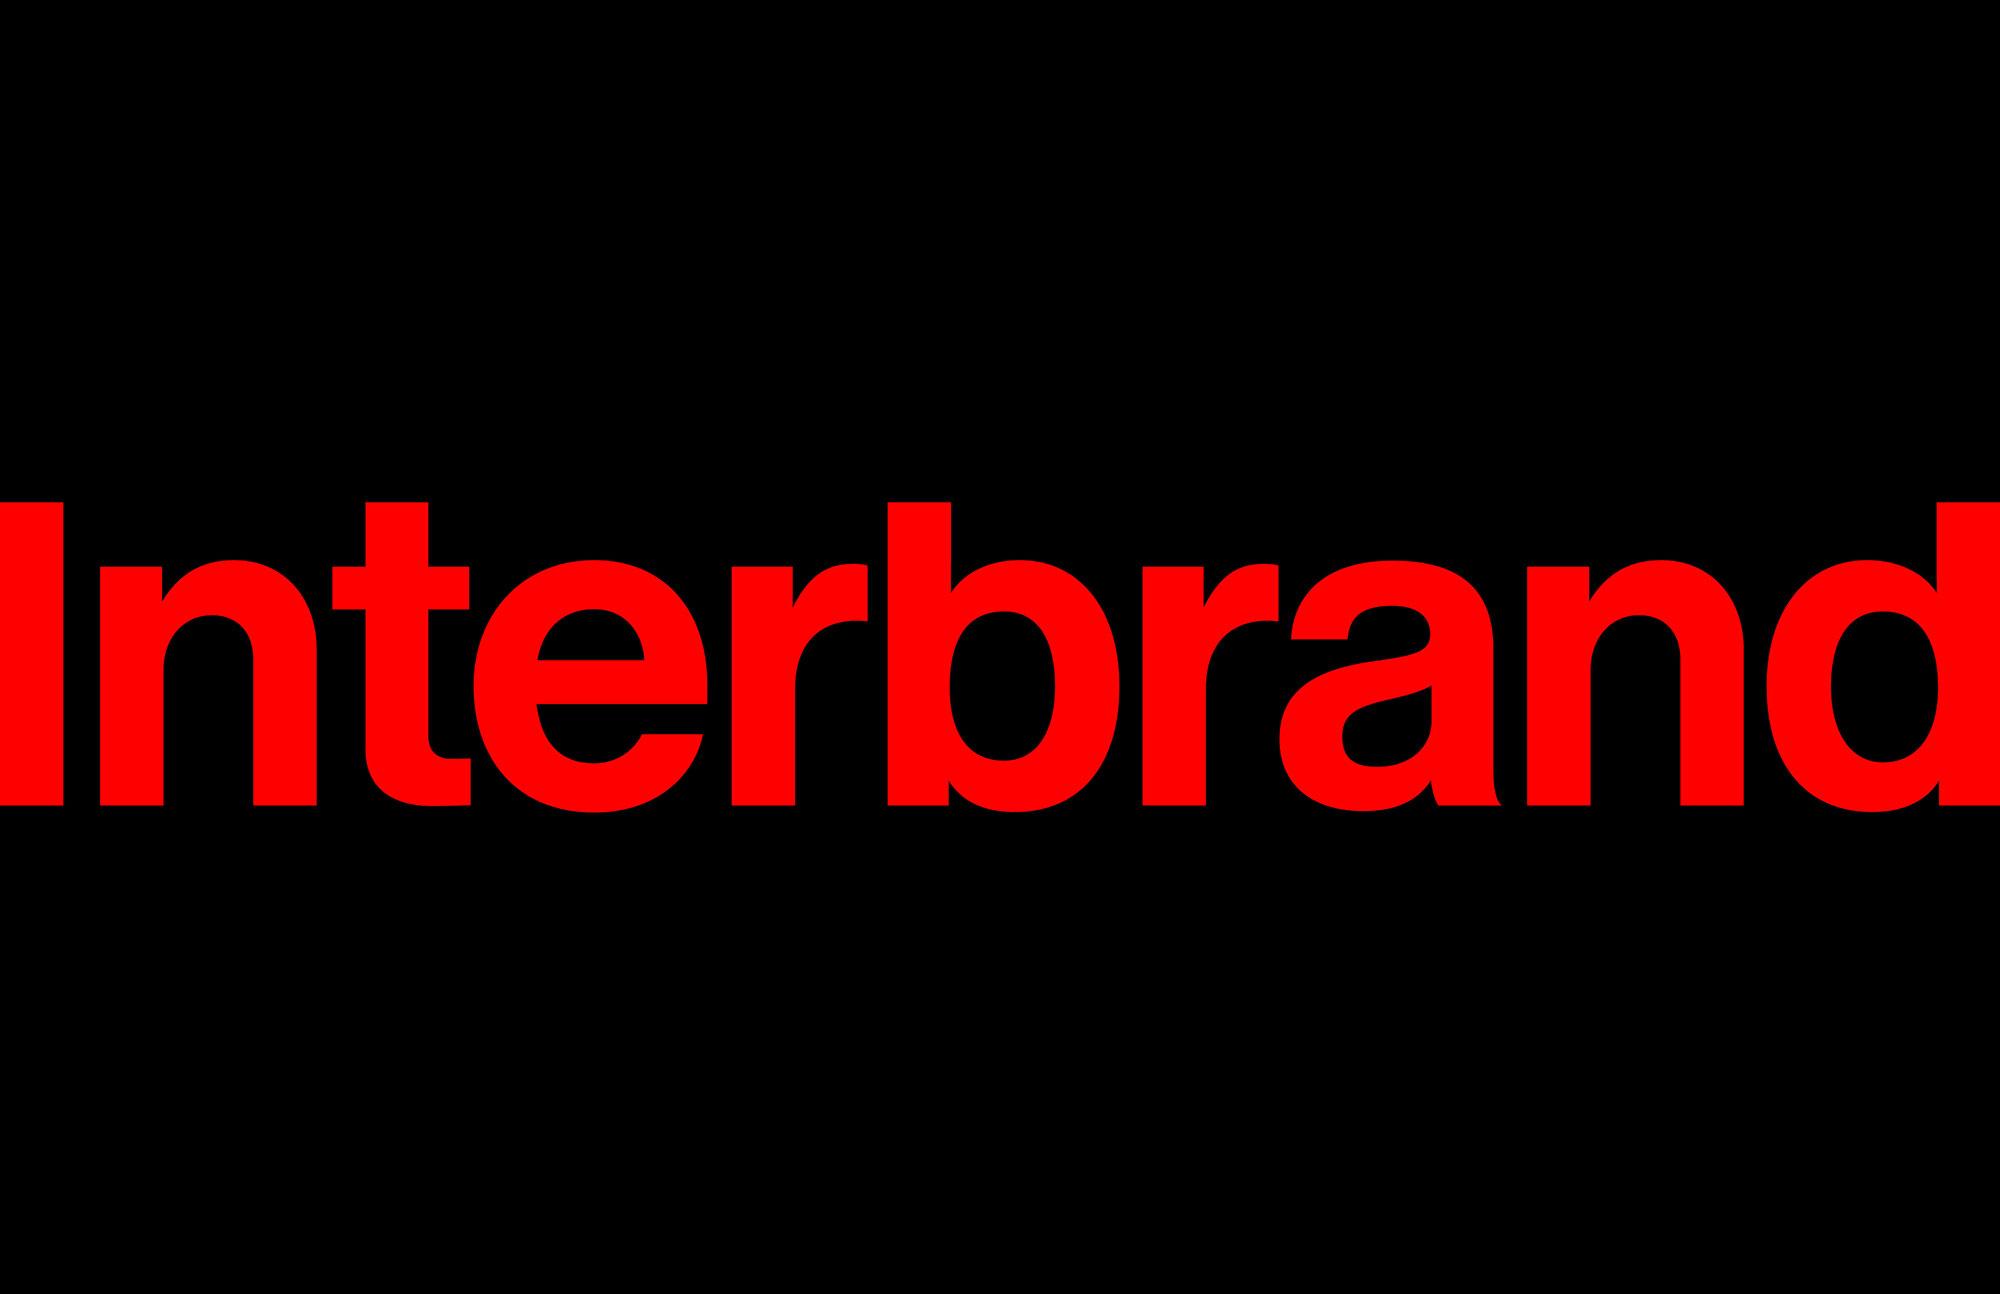 Team Logo Design Ideas